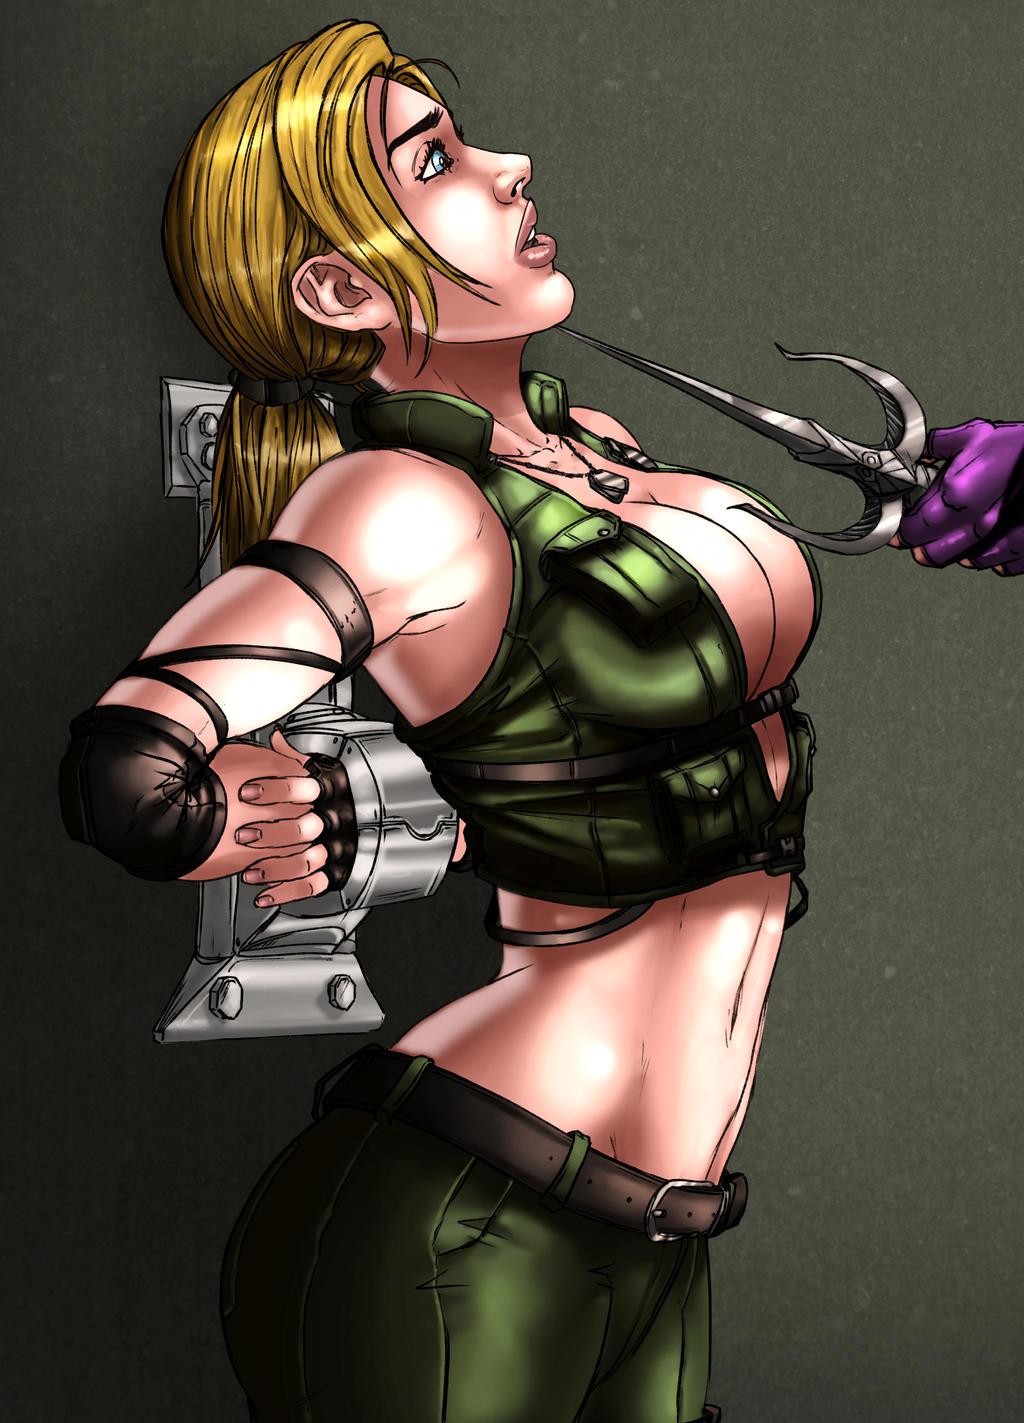 Sonya vixen erotic pics